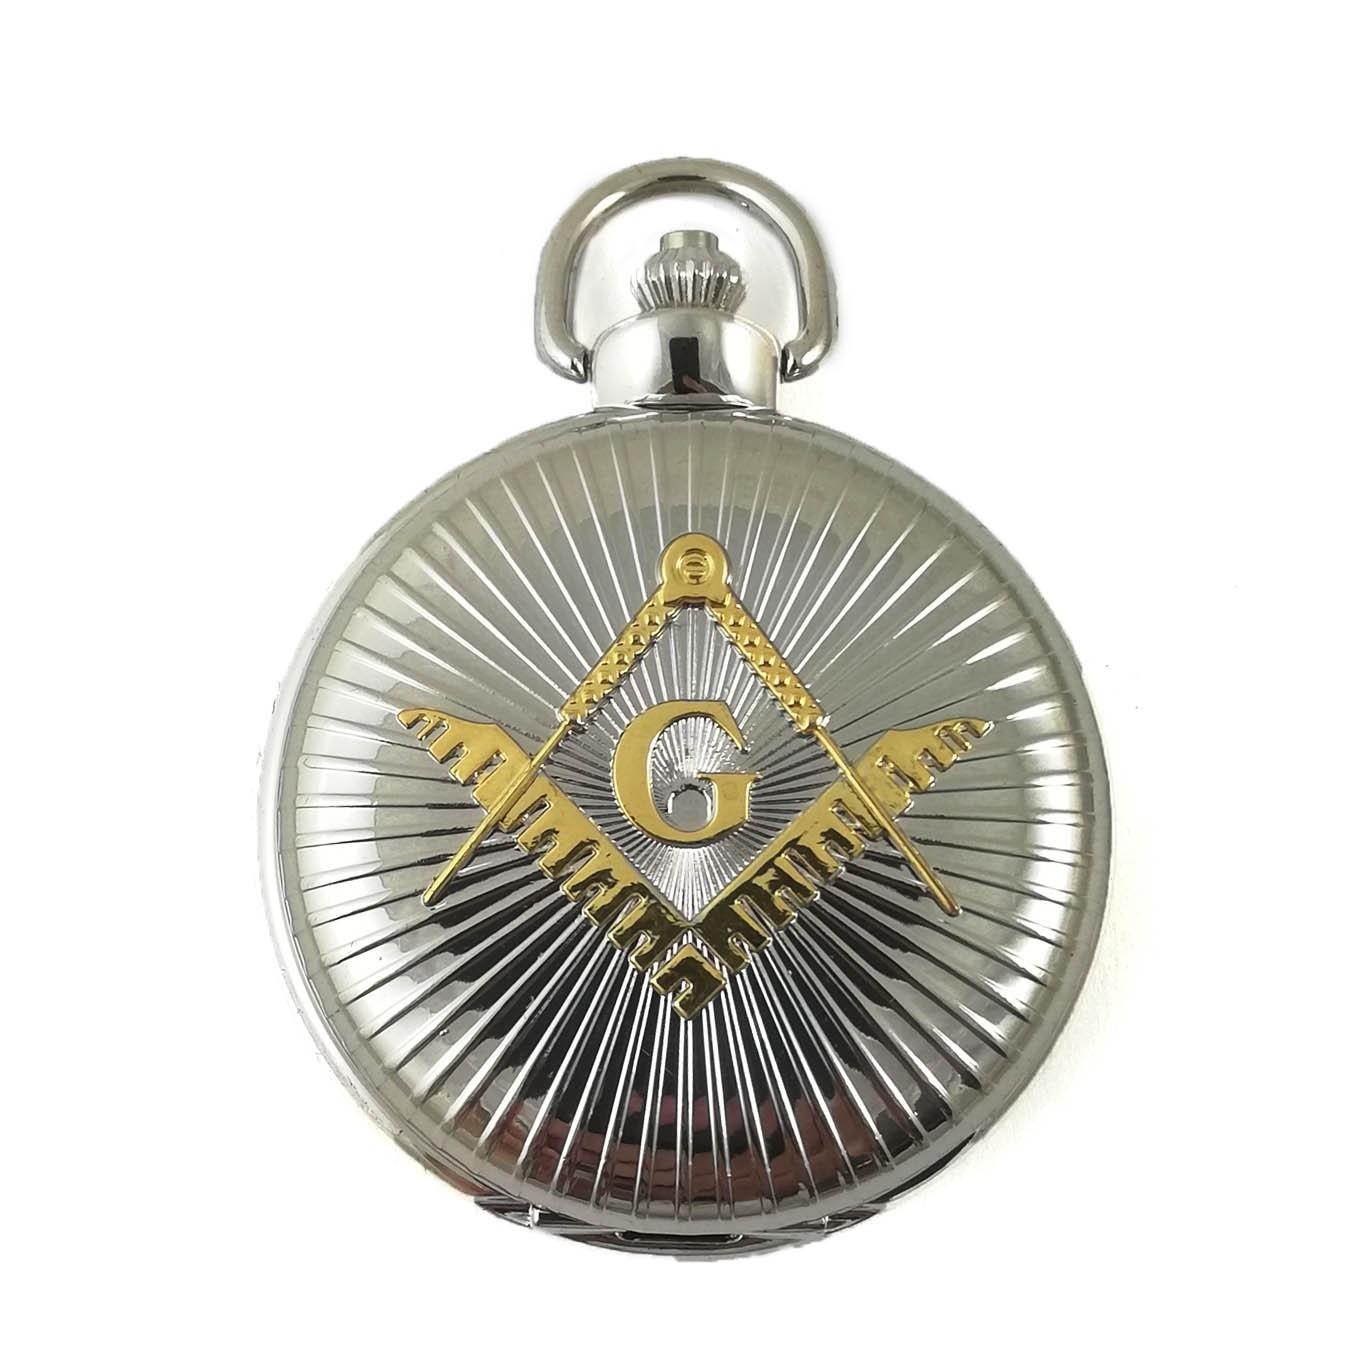 Ceas de buzunar masonic Argintiu cu simbol Auriu - MM894 imagine techstar.ro 2021